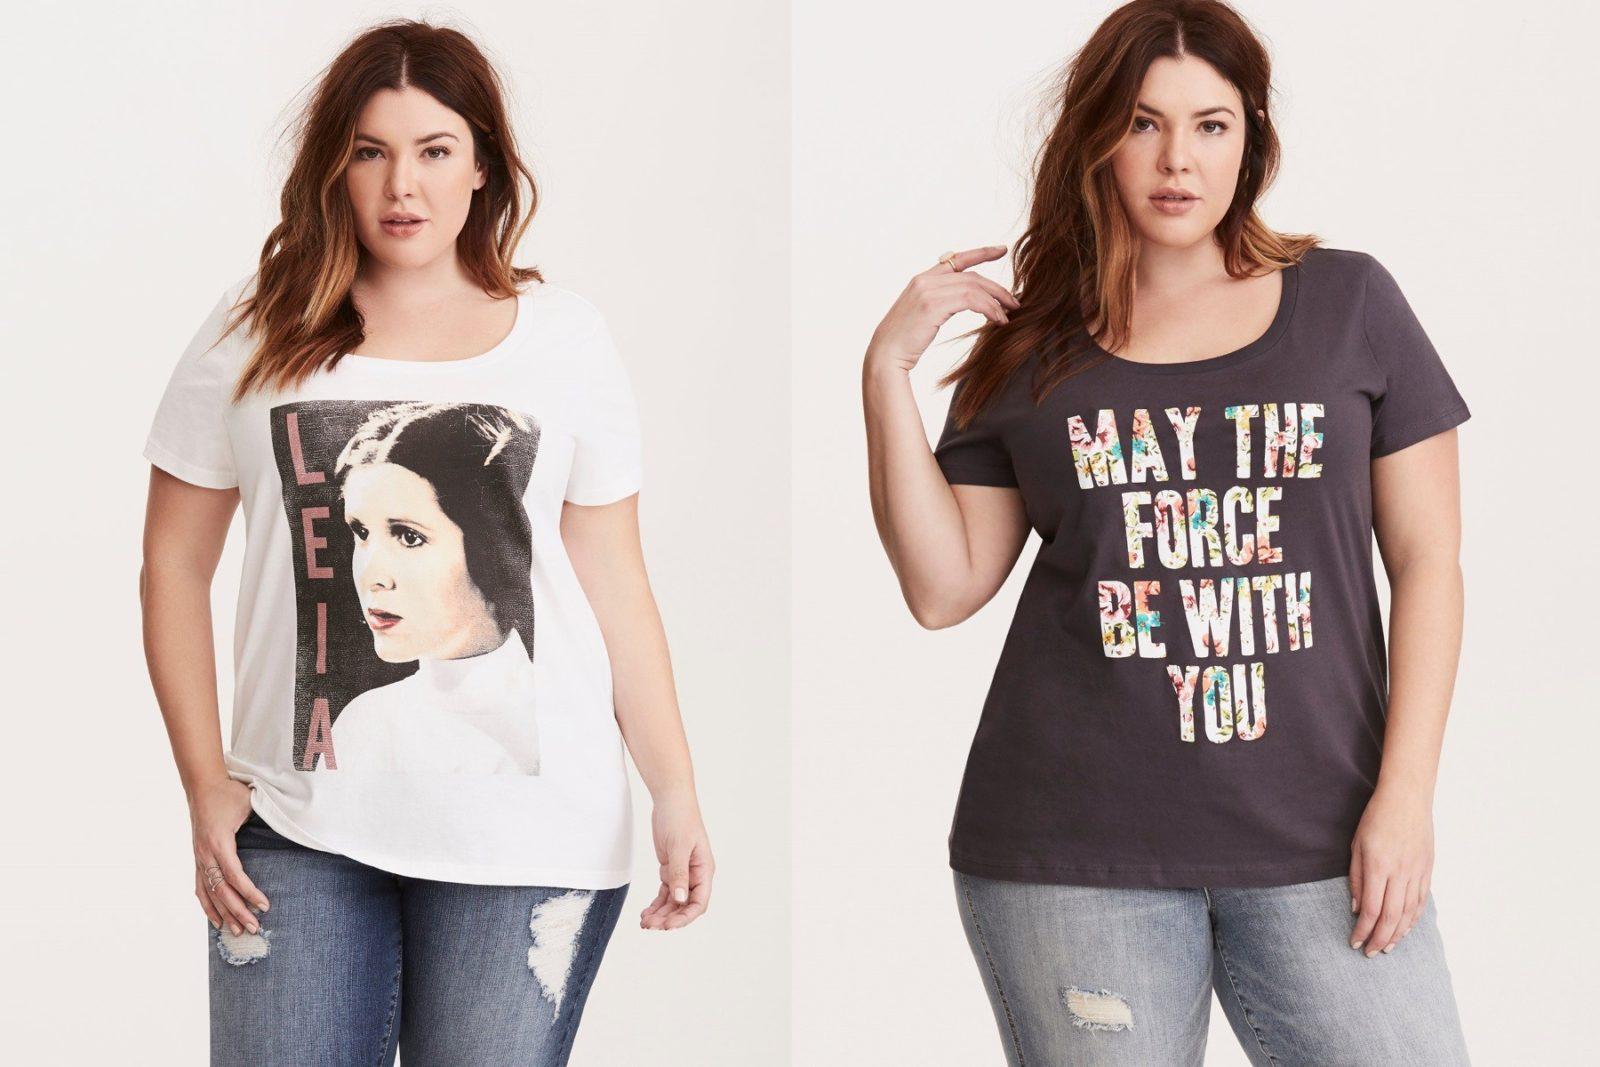 New women's Star Wars plus size tees at Torrid